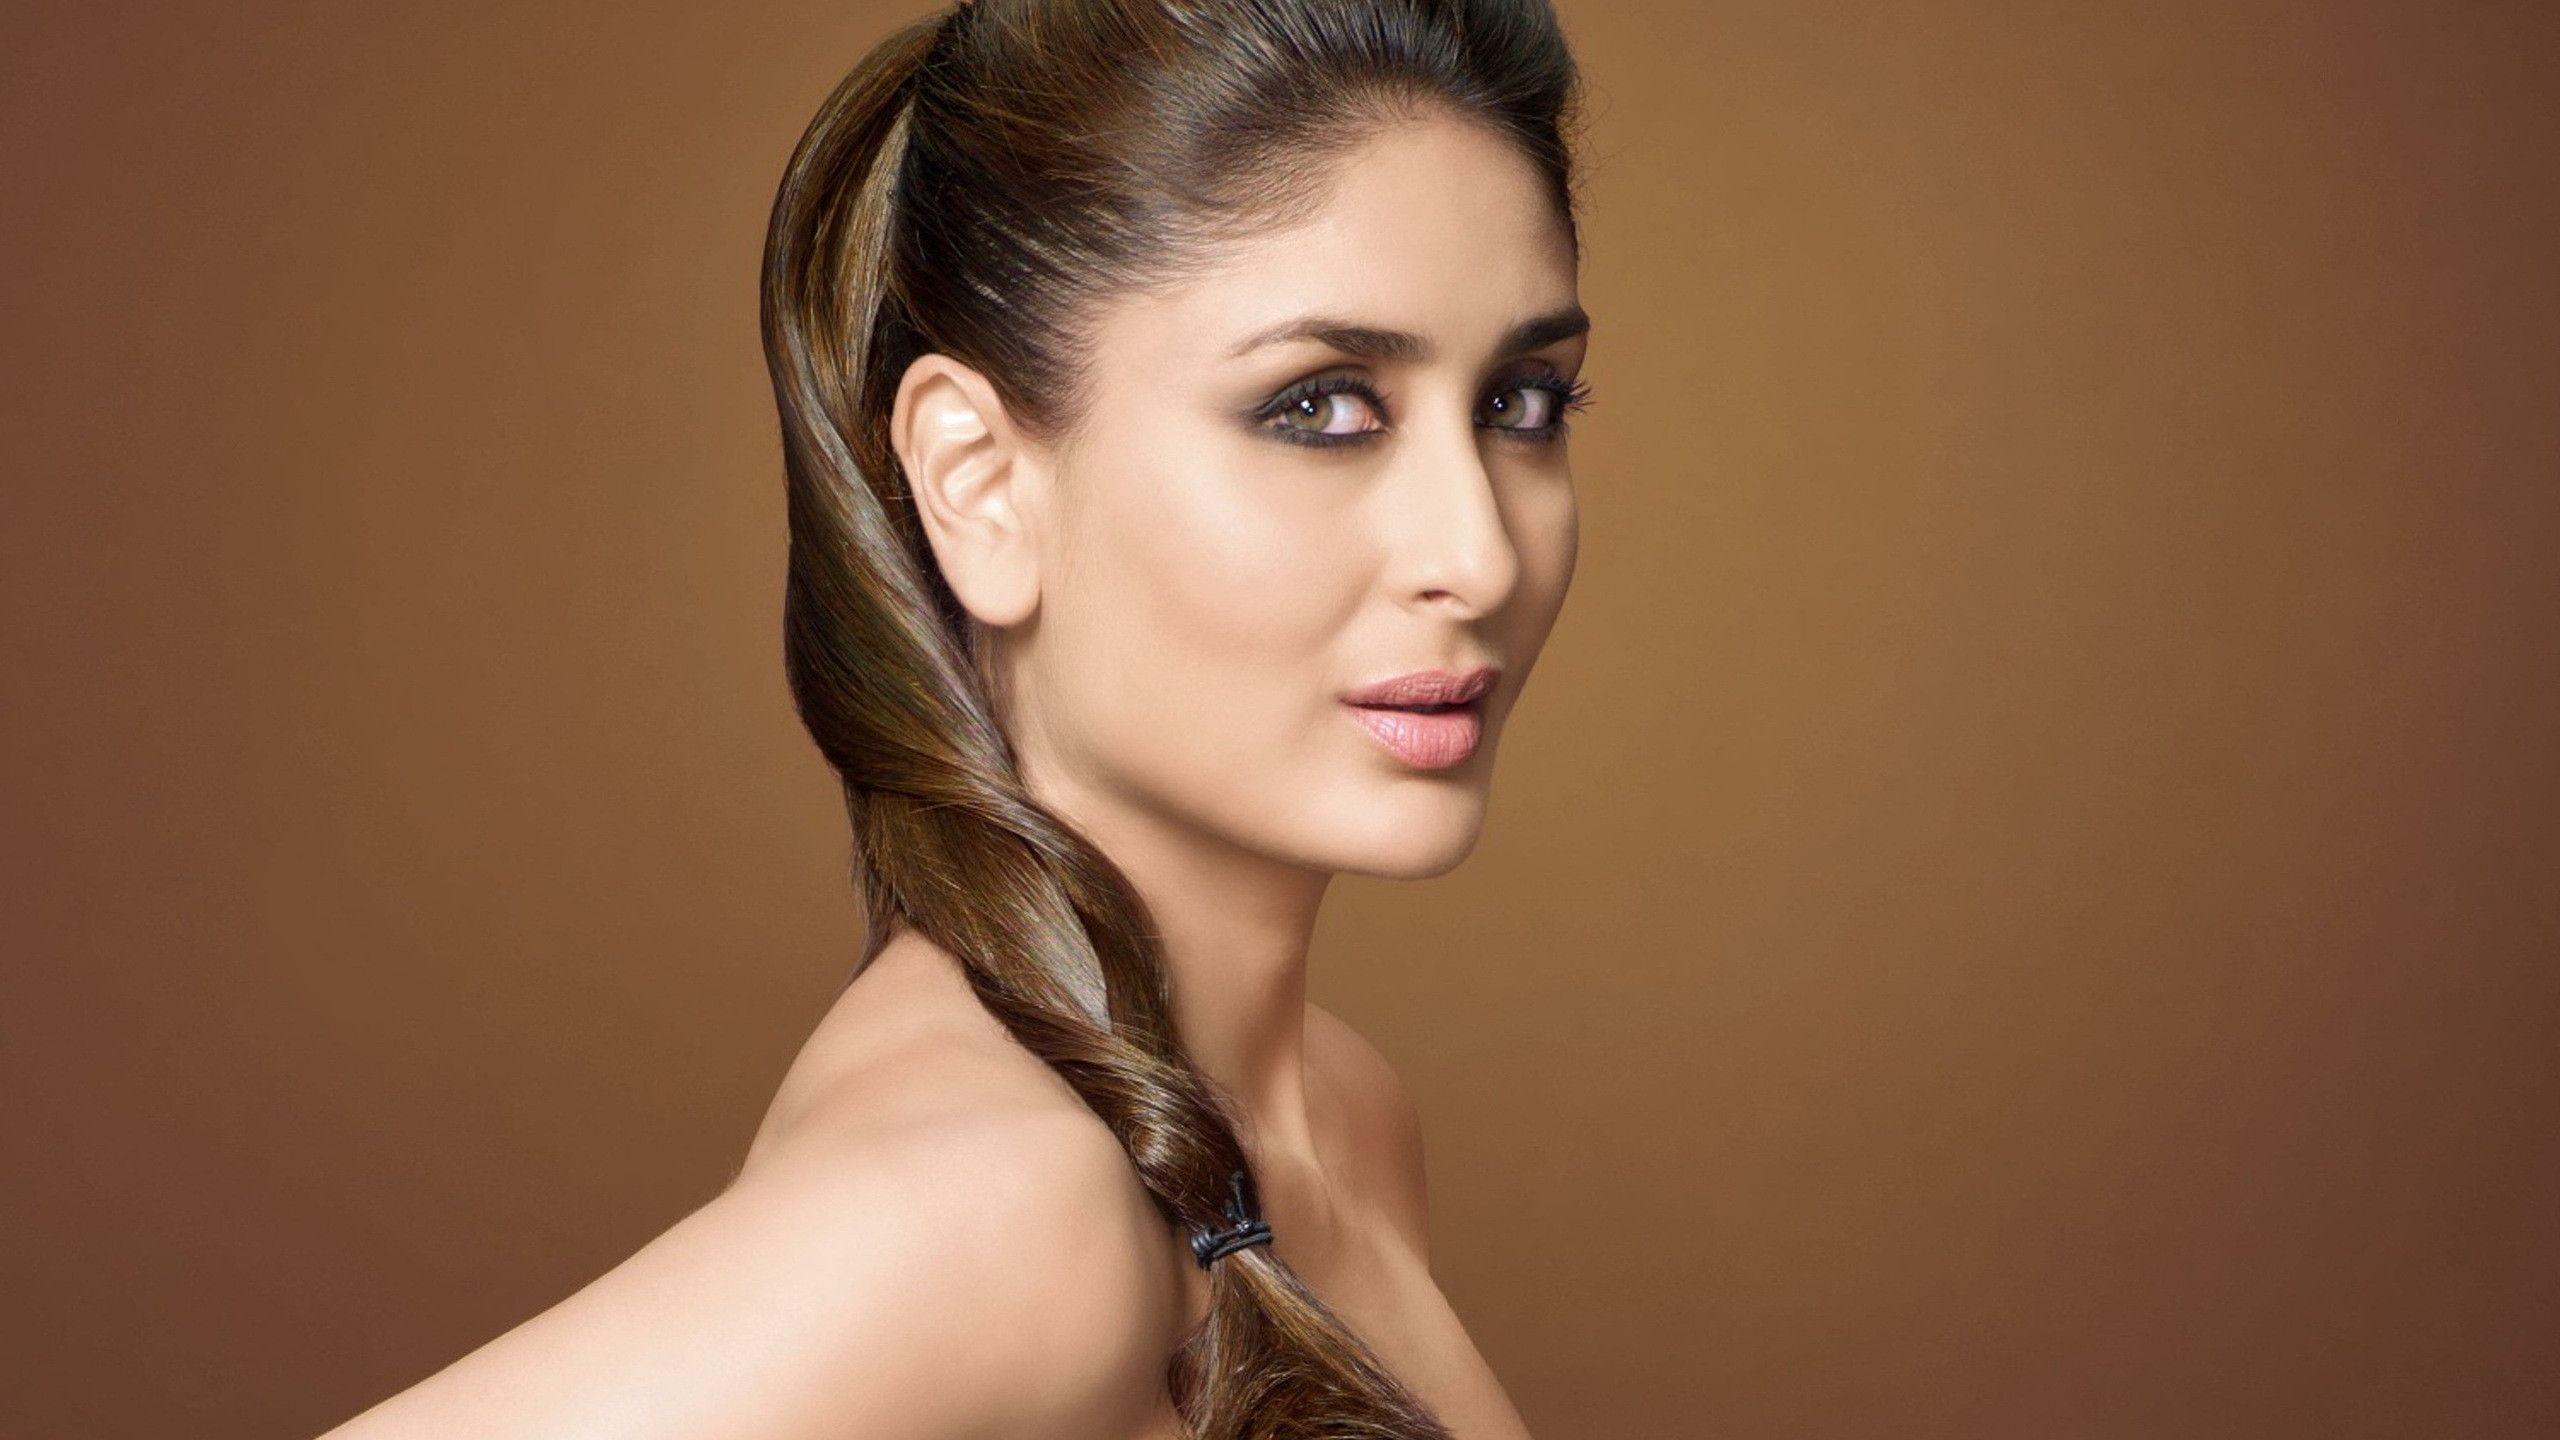 Full HD Wallpapers Bollywood Actress 2560x1440